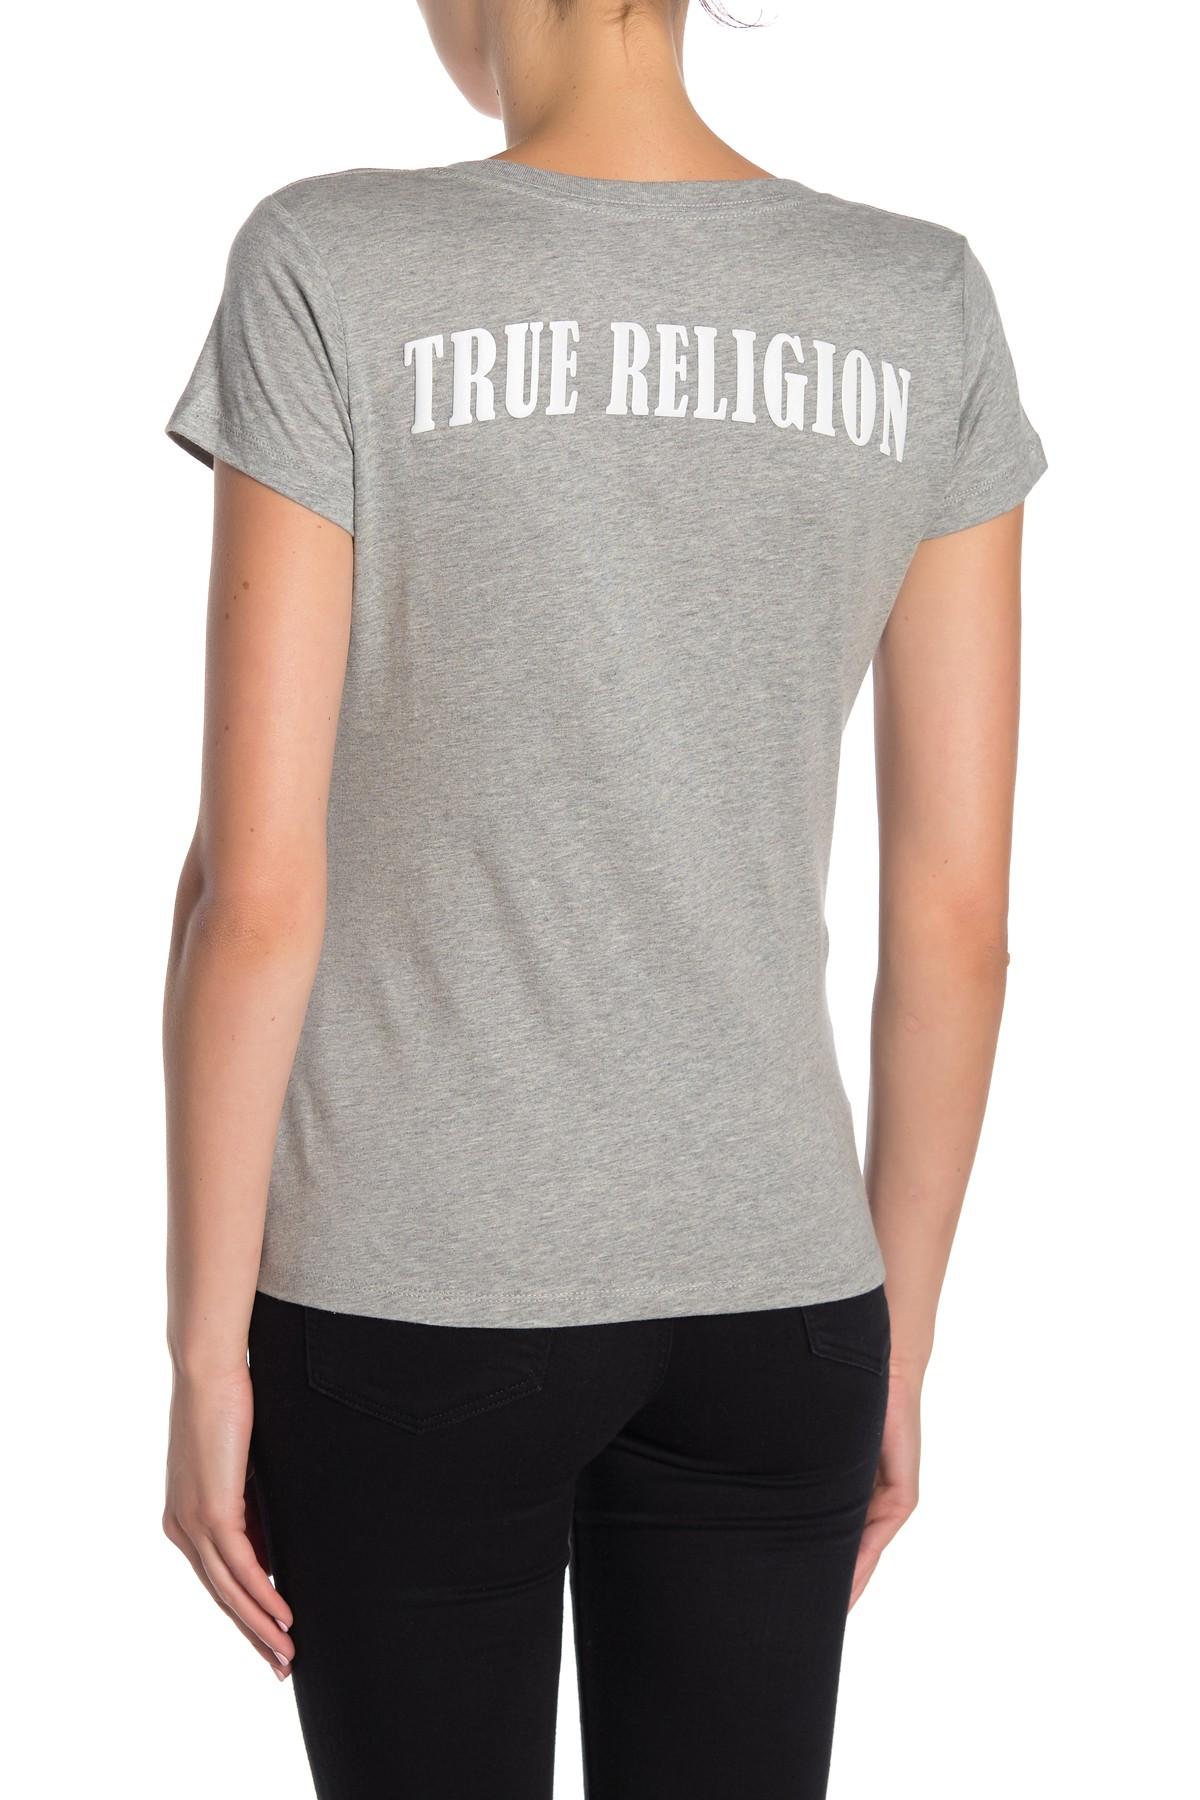 True-Religion-Women-039-s-Double-Puff-V-Neck-Tee-T-Shirt thumbnail 7